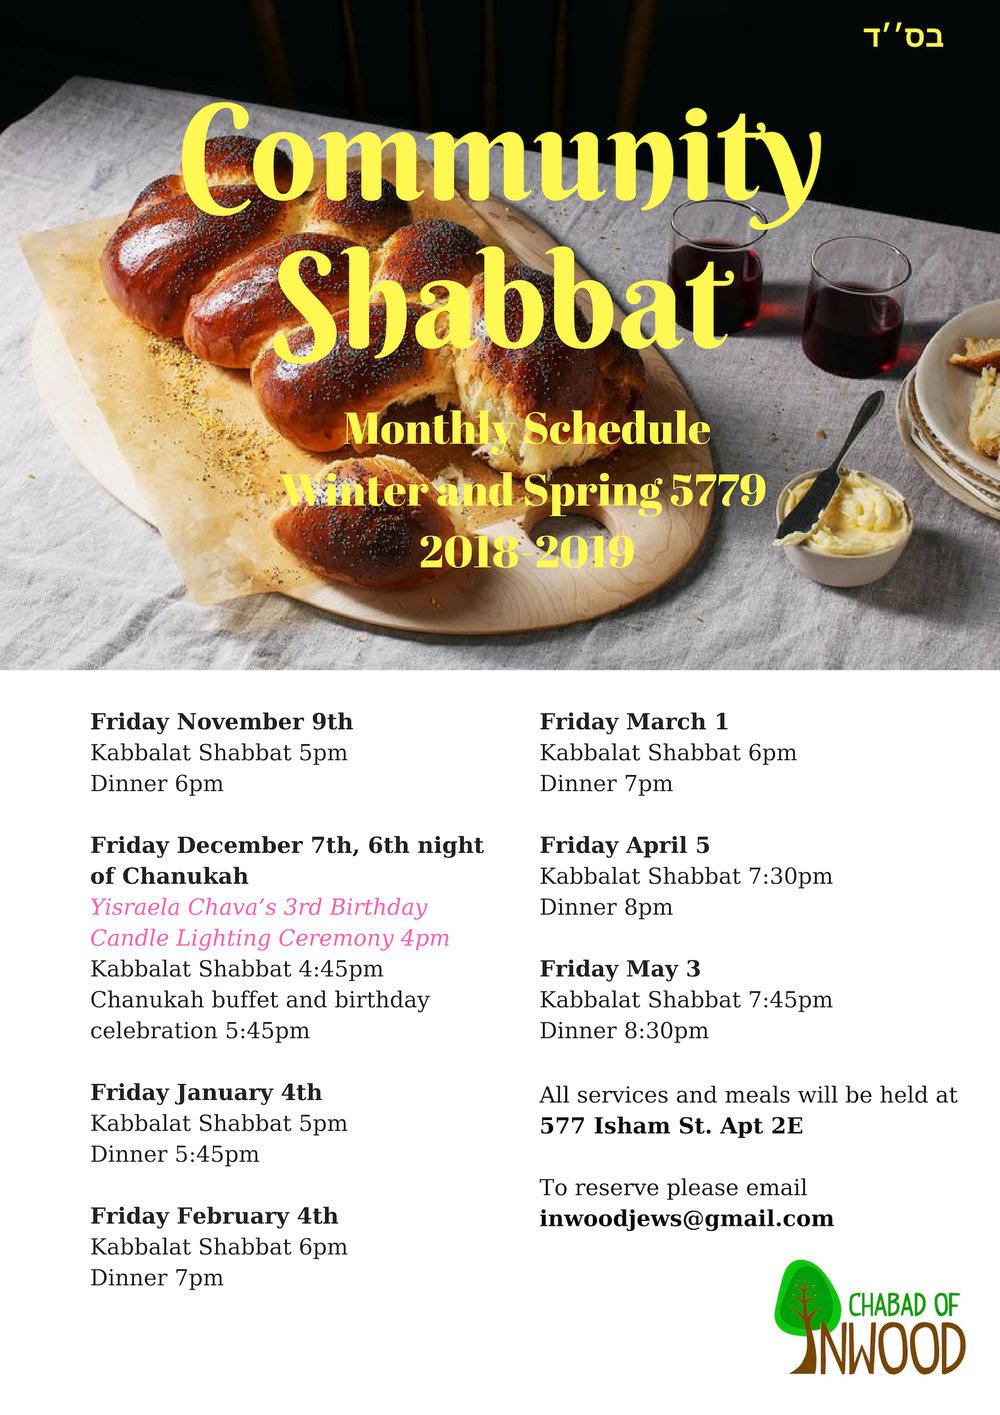 Community Shabbat (1).jpg